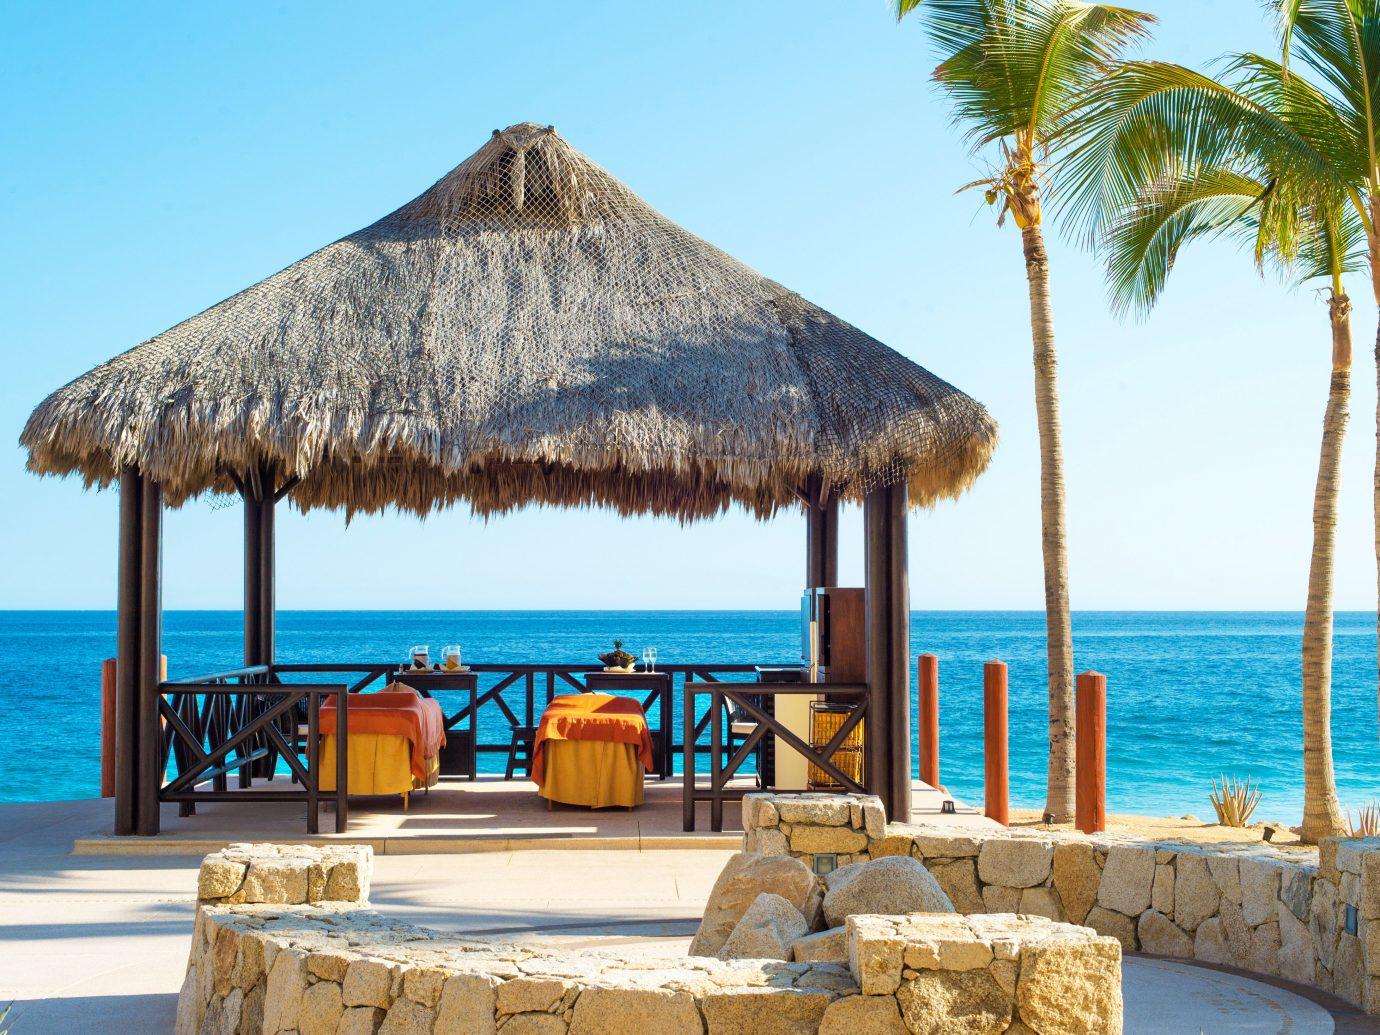 Overwater spa at Secrets Puerto Los Cabos Golf & Spa Resort